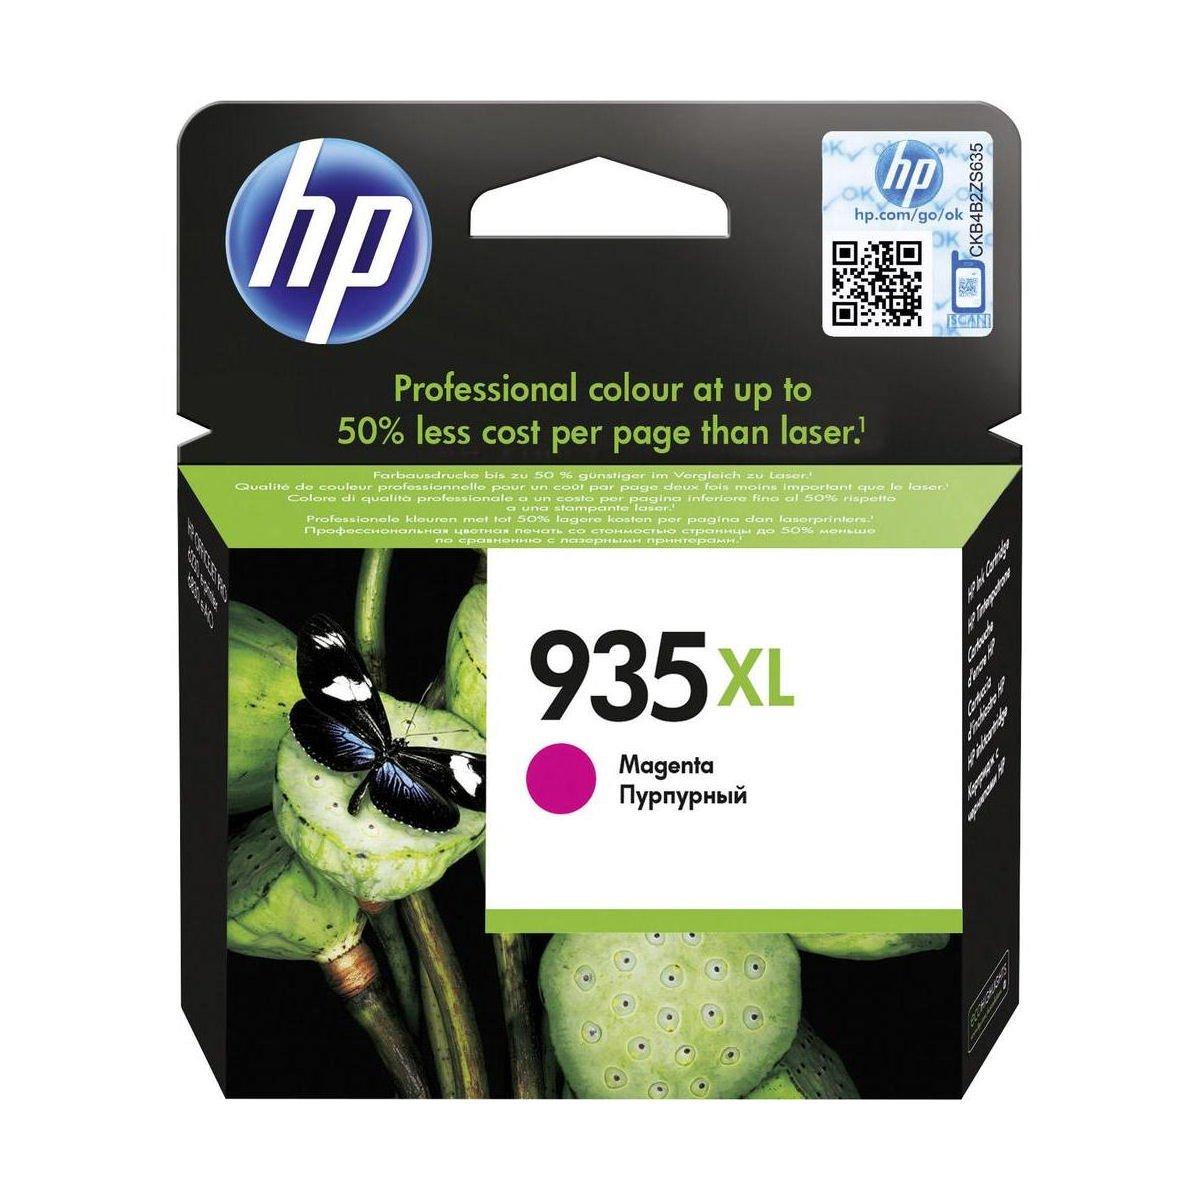 HP No.935XL Inkjet Cartridge High Capacity Magenta C2P25AE